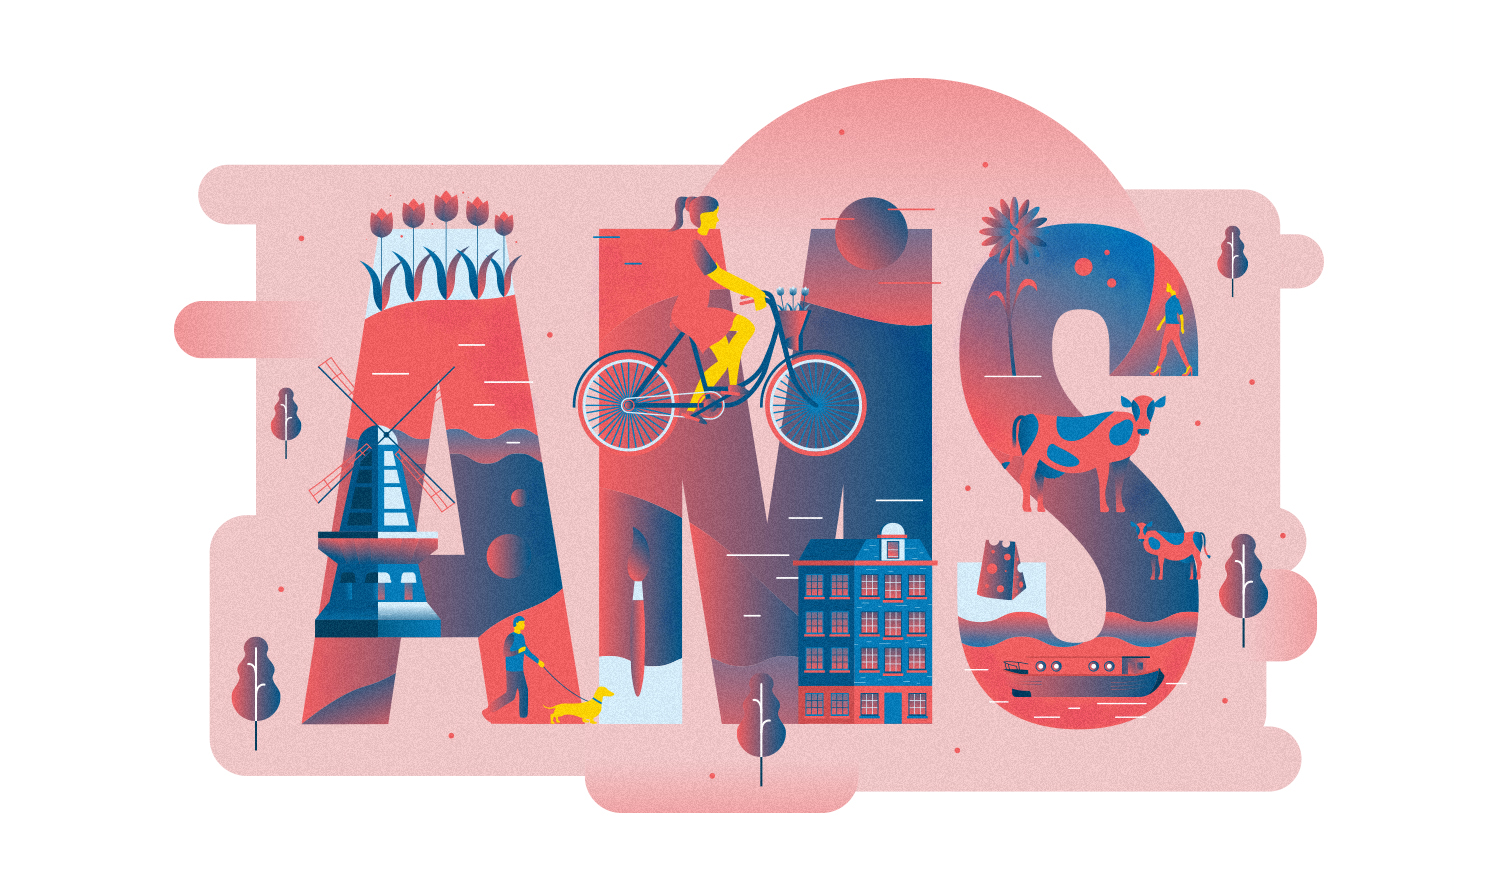 rgbvn-creative-chuoi-tranh-minh-hoa-day-cam-hung-tu-sail-ho-studio-2